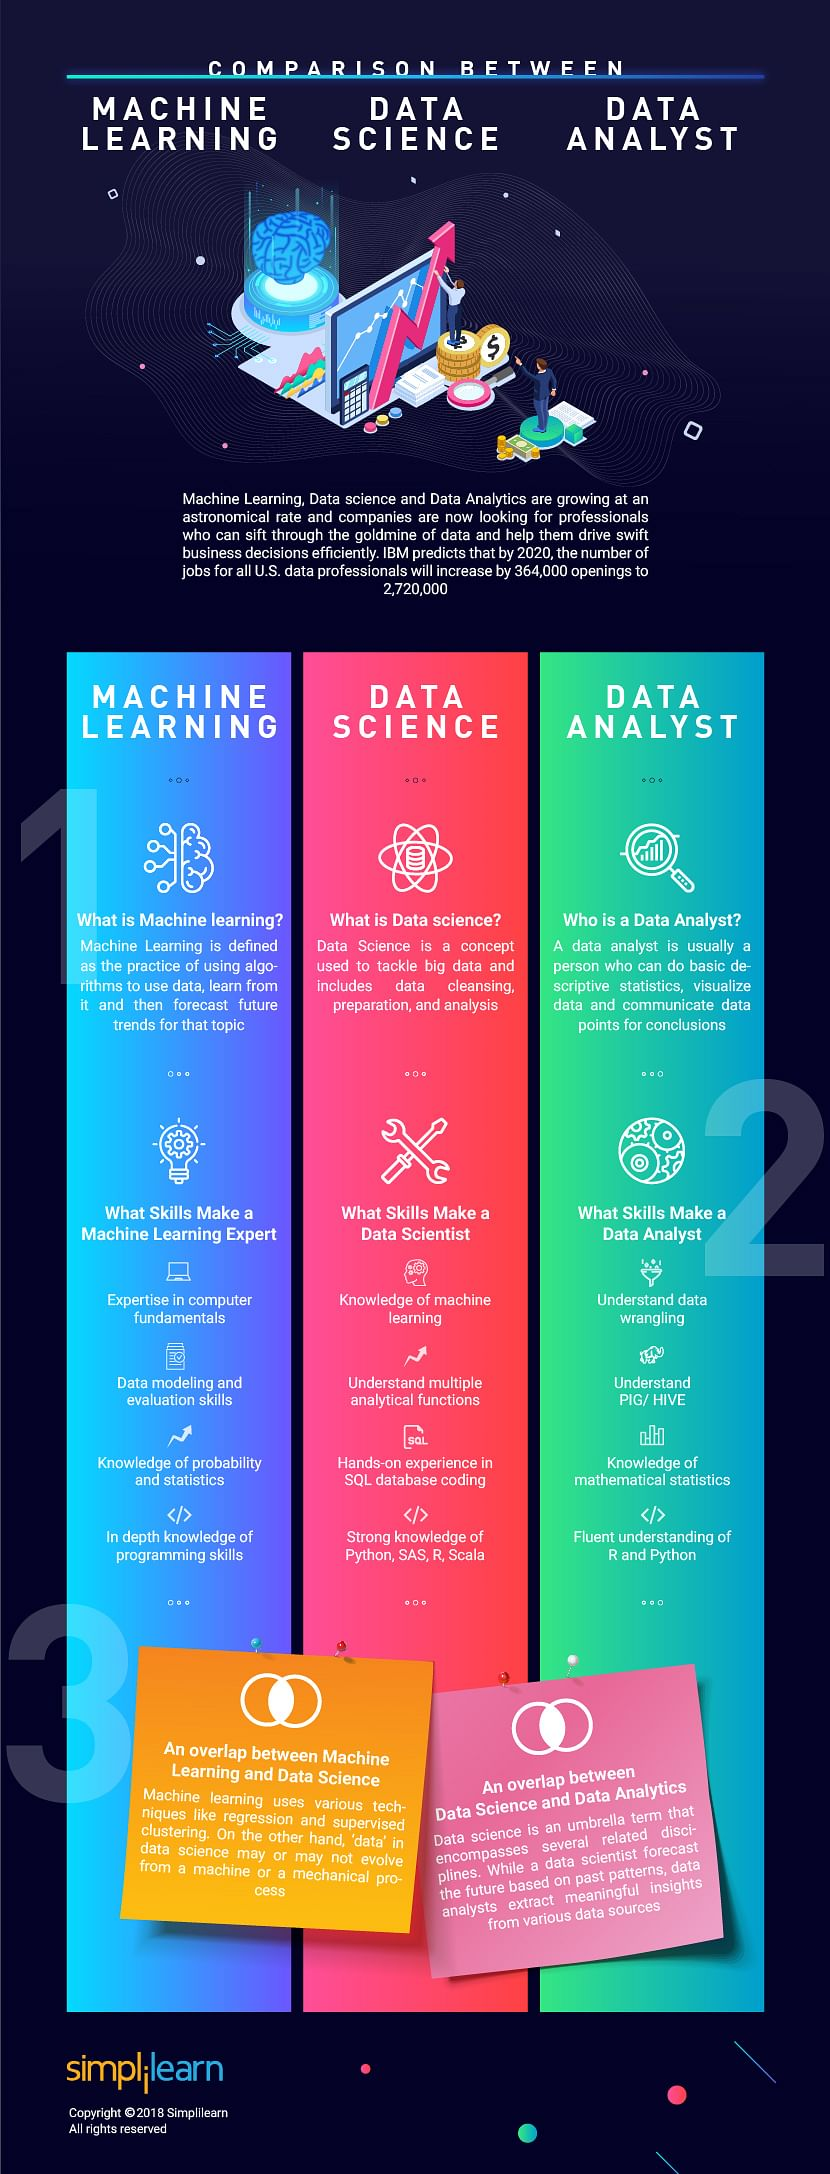 Data Science vs Data Analytics vs Machine Learning